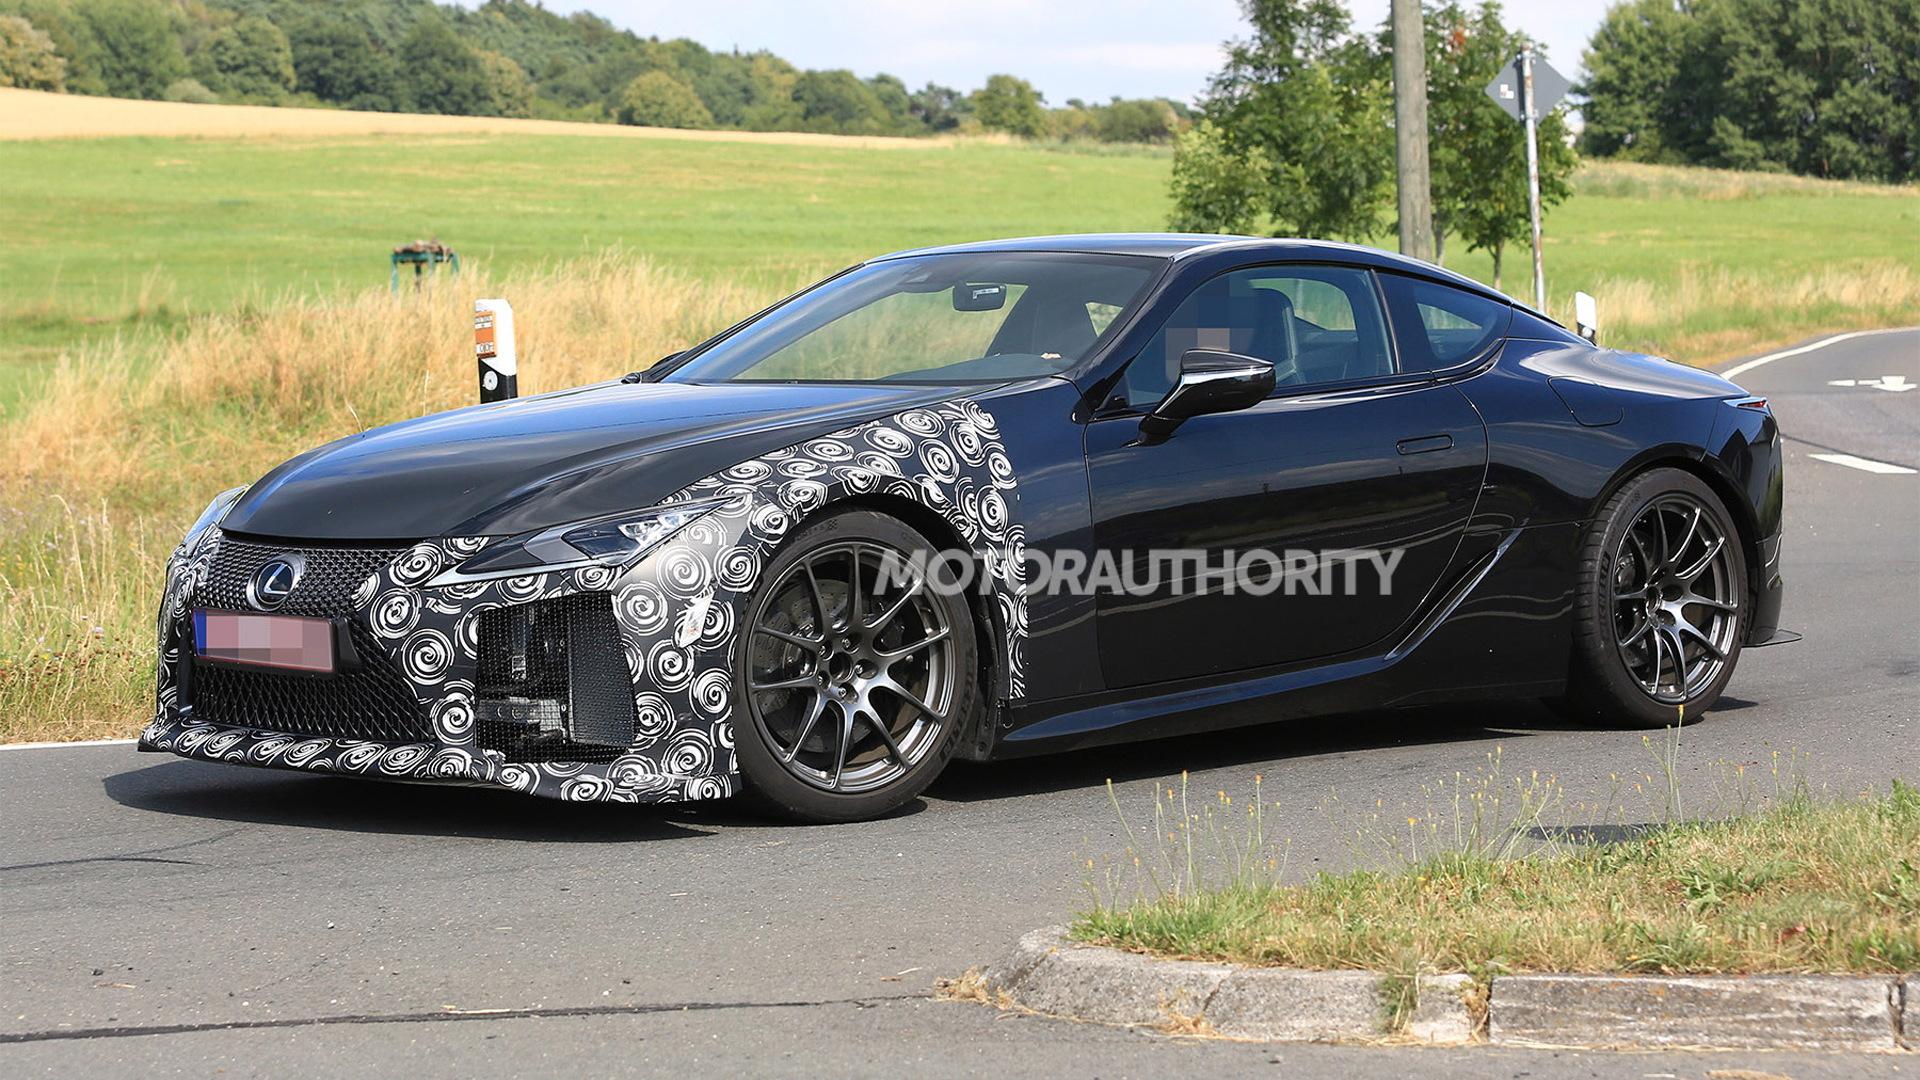 2021 Lexus LC F spy shots - Image via S. Baldauf/SB-Medien